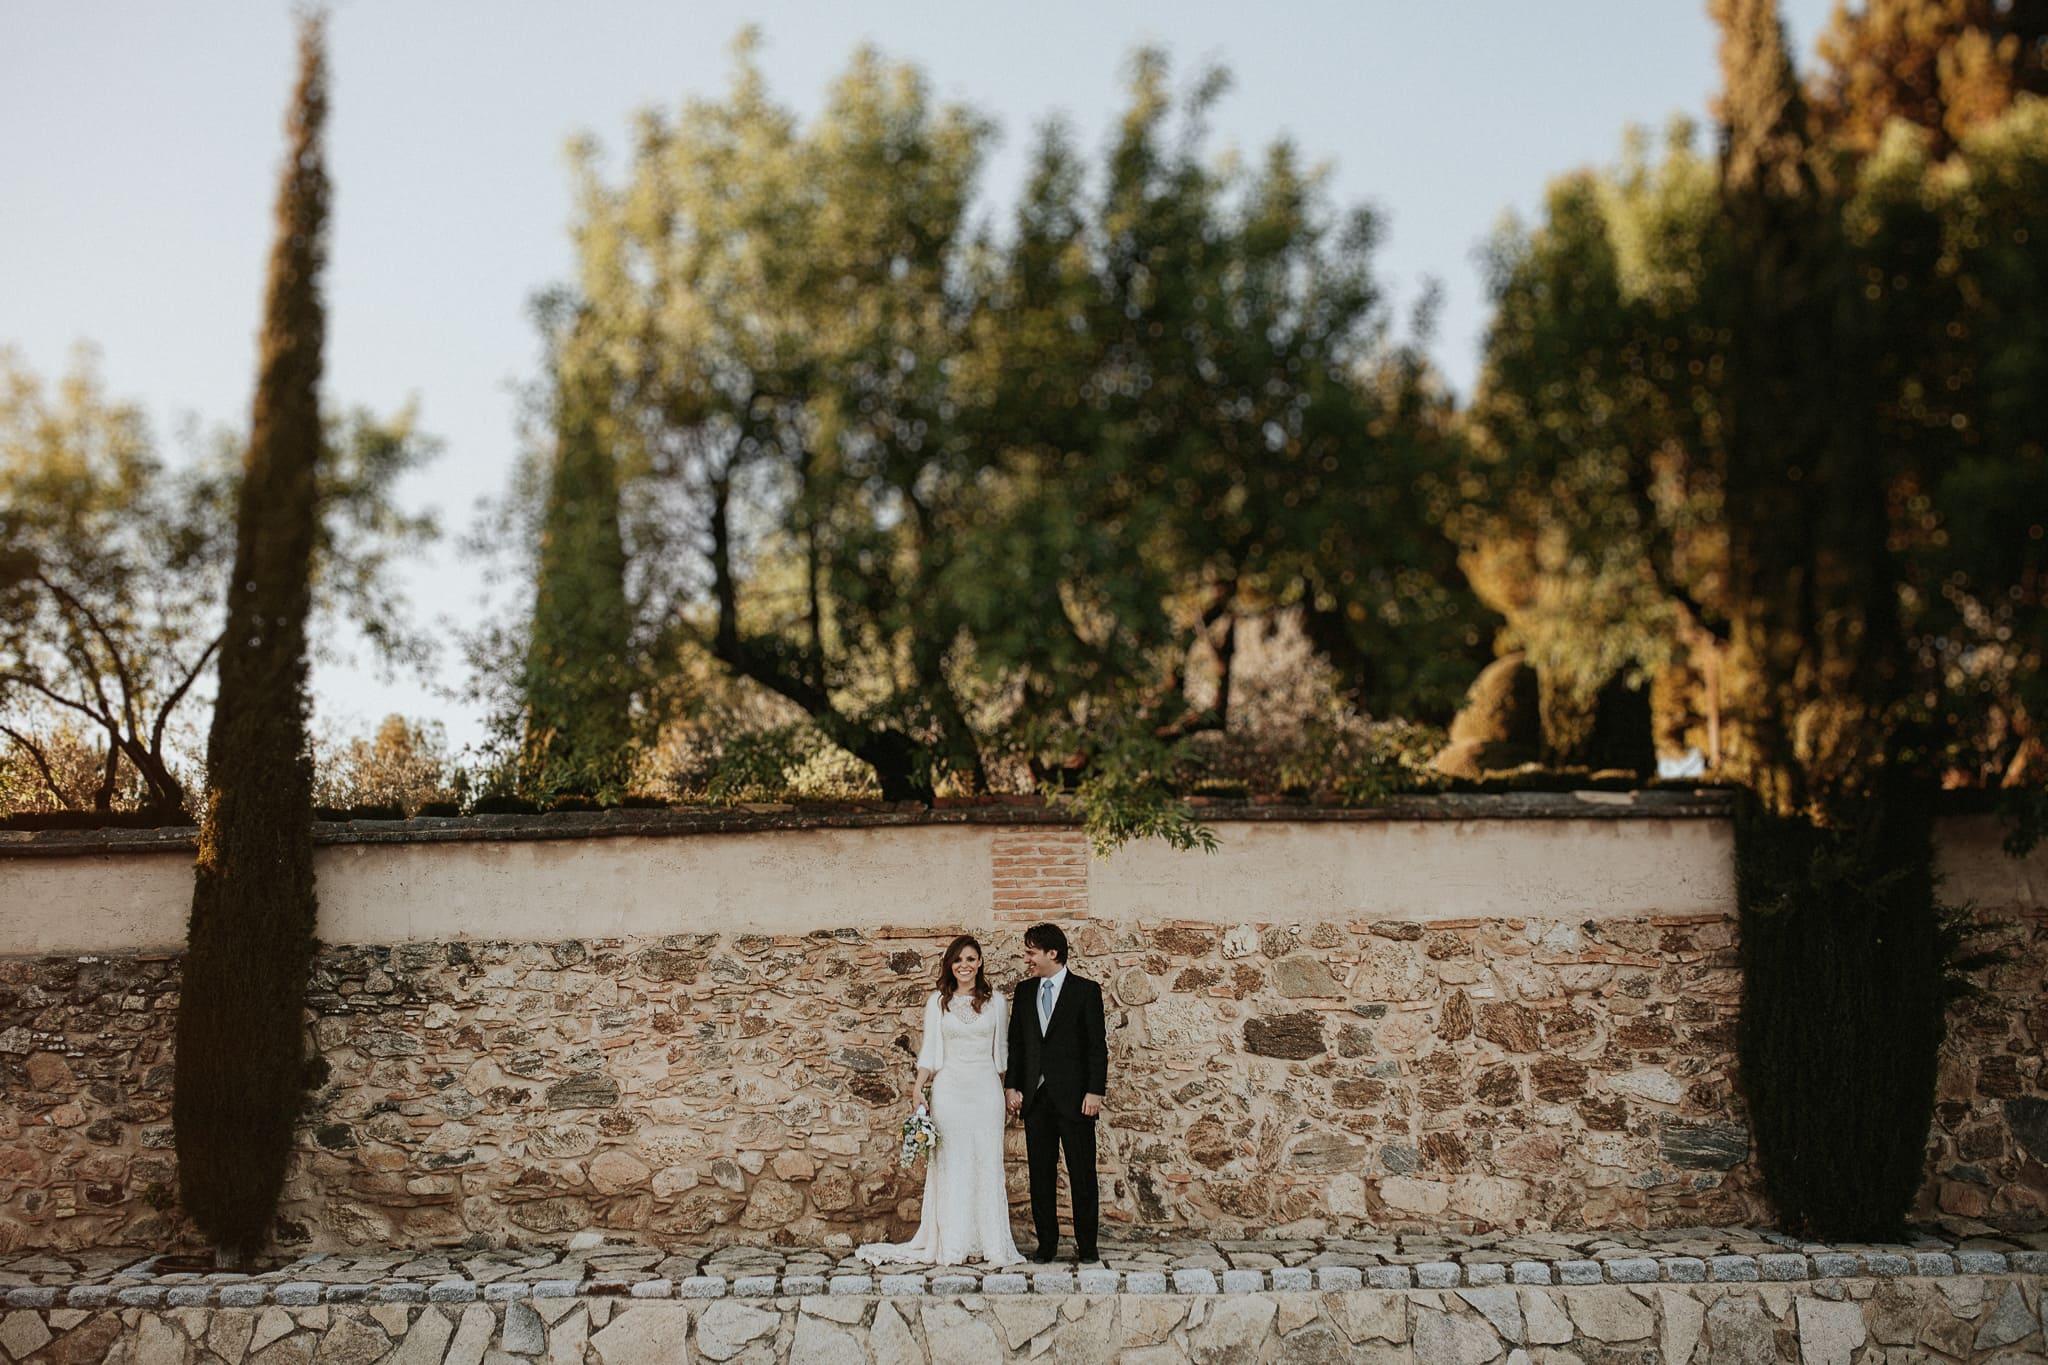 Fotografo-bodas-Cigarral-de-las-Mercedes-106